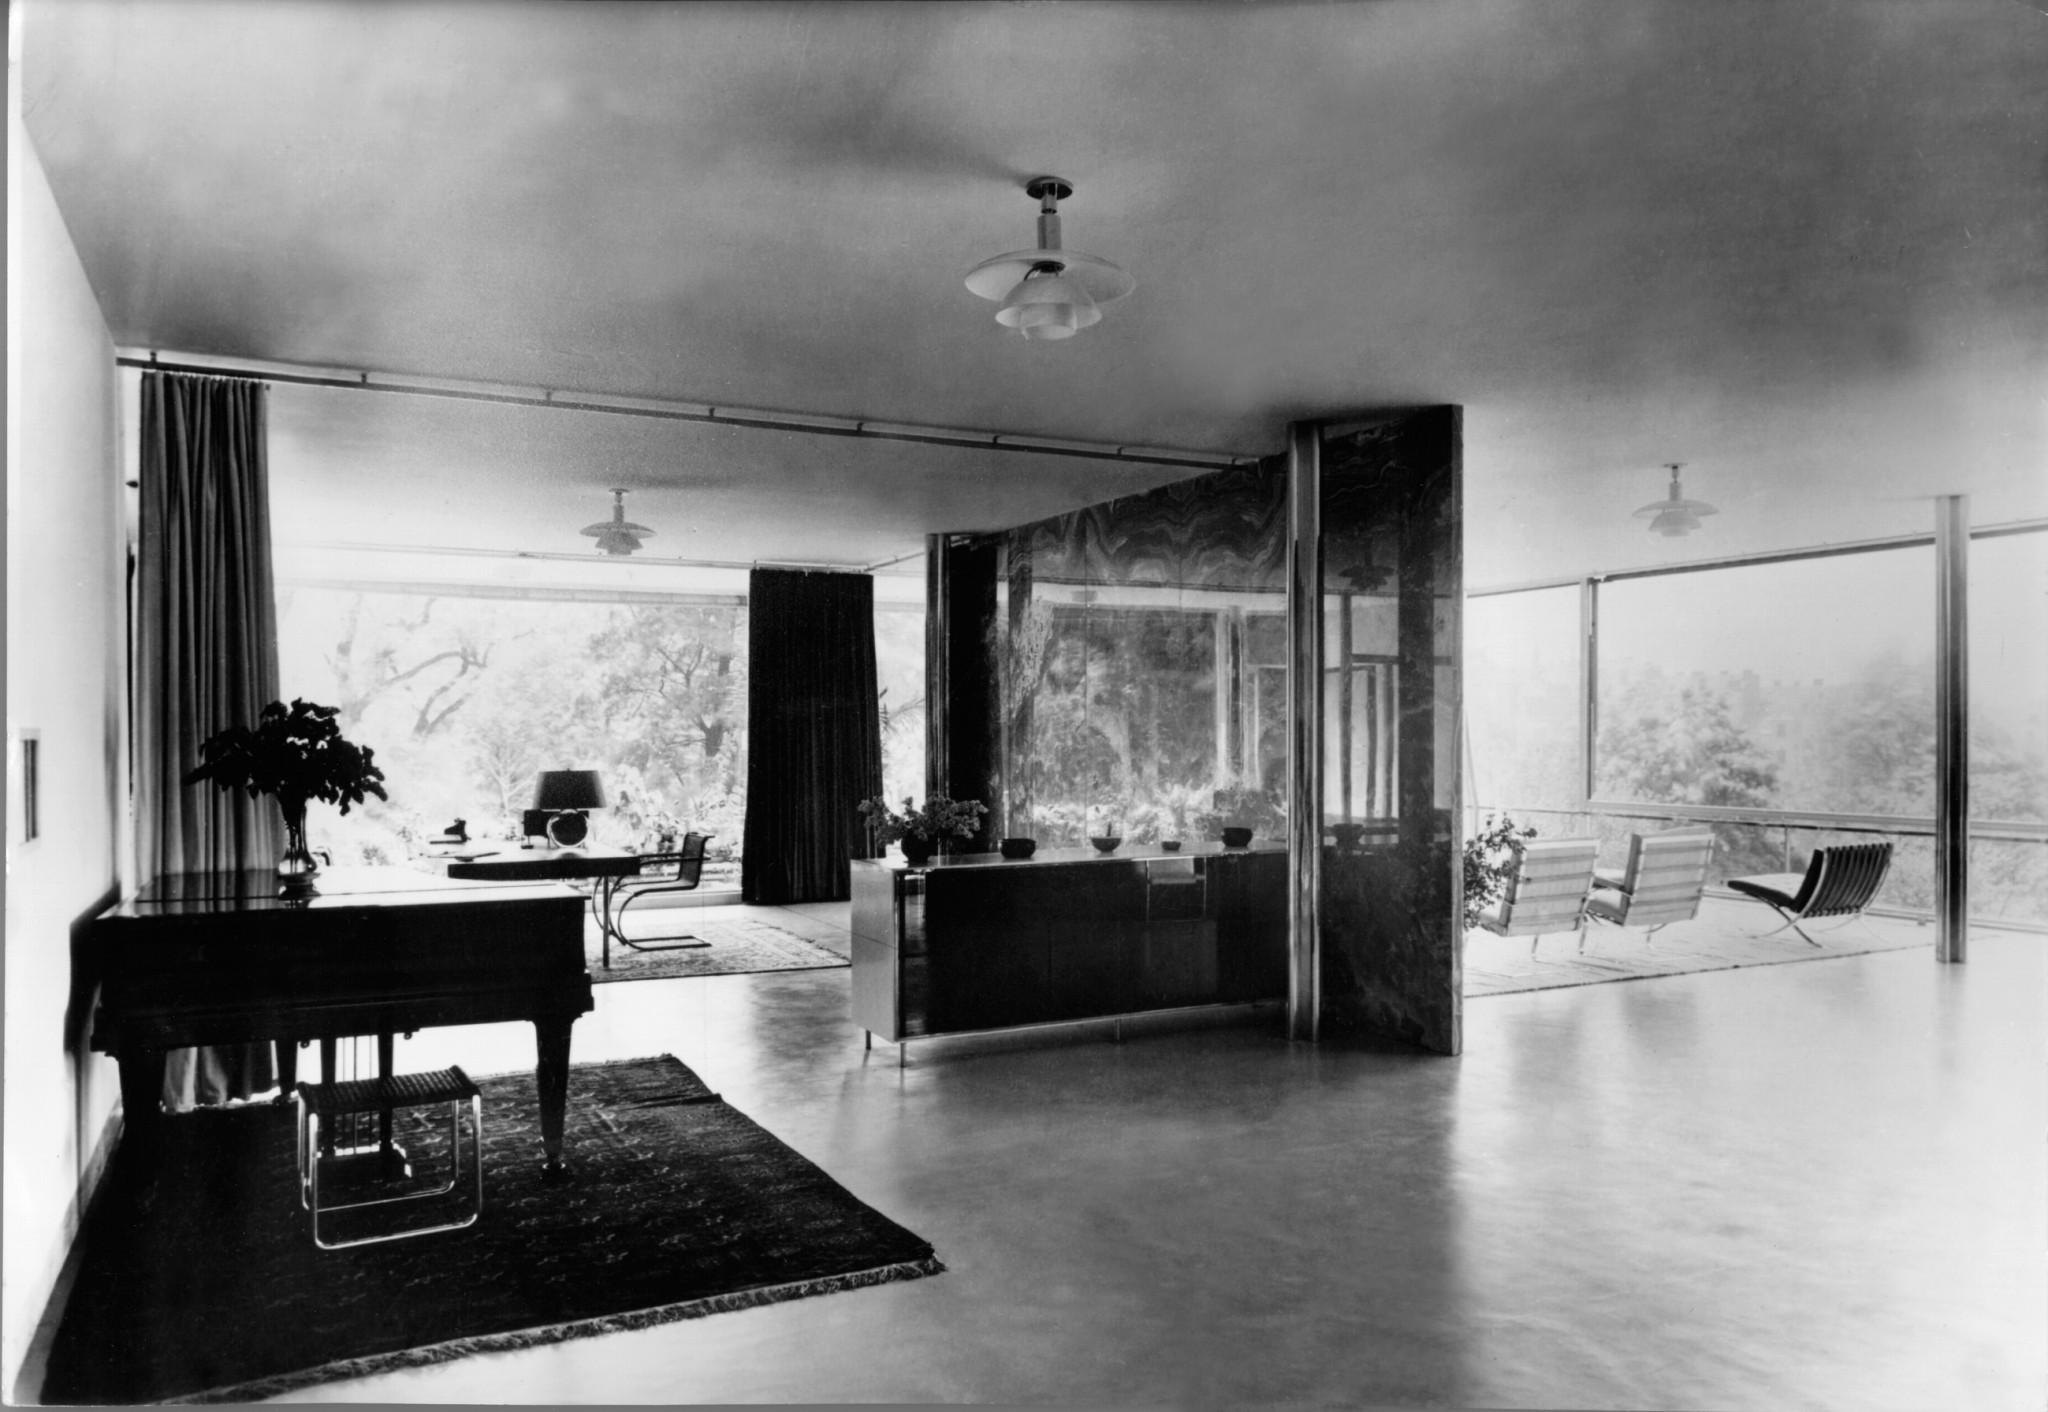 dokumentarfilm haus tugendhat im monopol kino ab 30 5 muenchenarchitektur. Black Bedroom Furniture Sets. Home Design Ideas